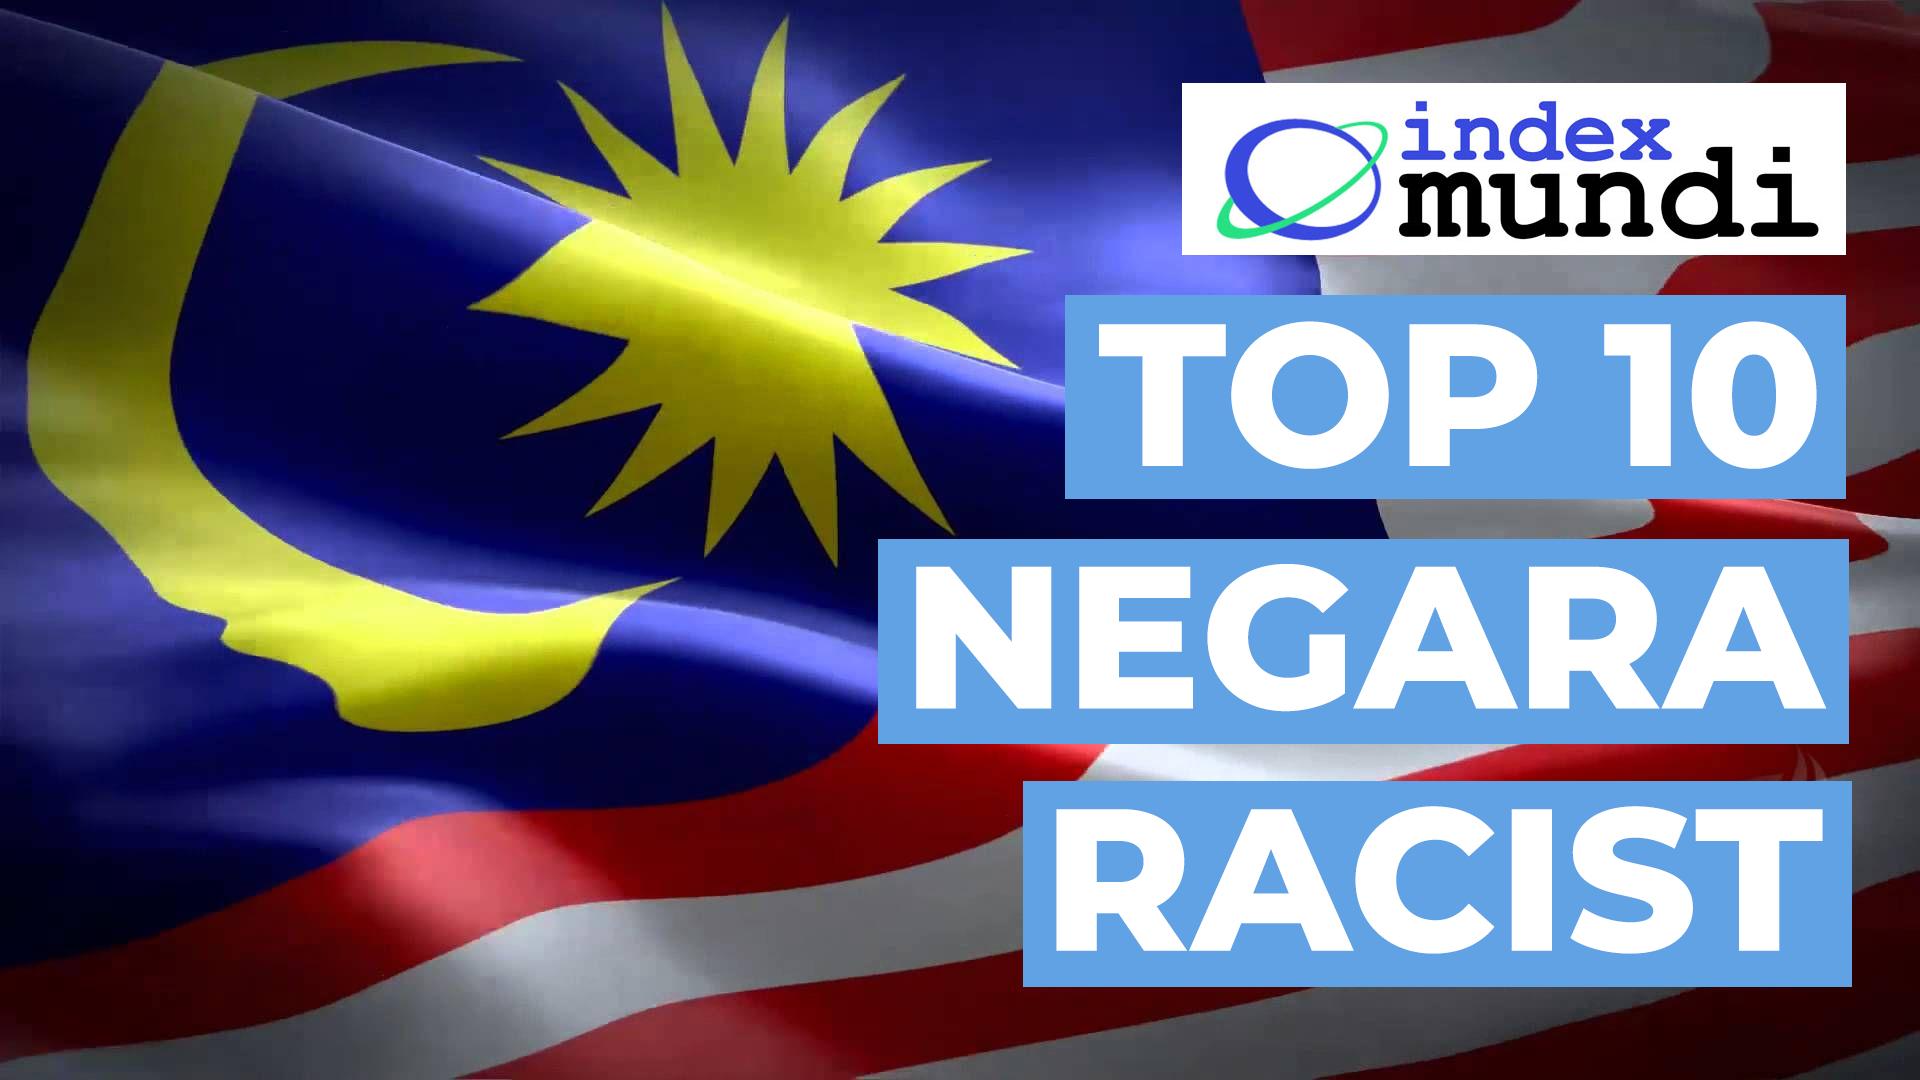 Malaysia No.2 Racist?! – Top Negara² dalam Index Mundi